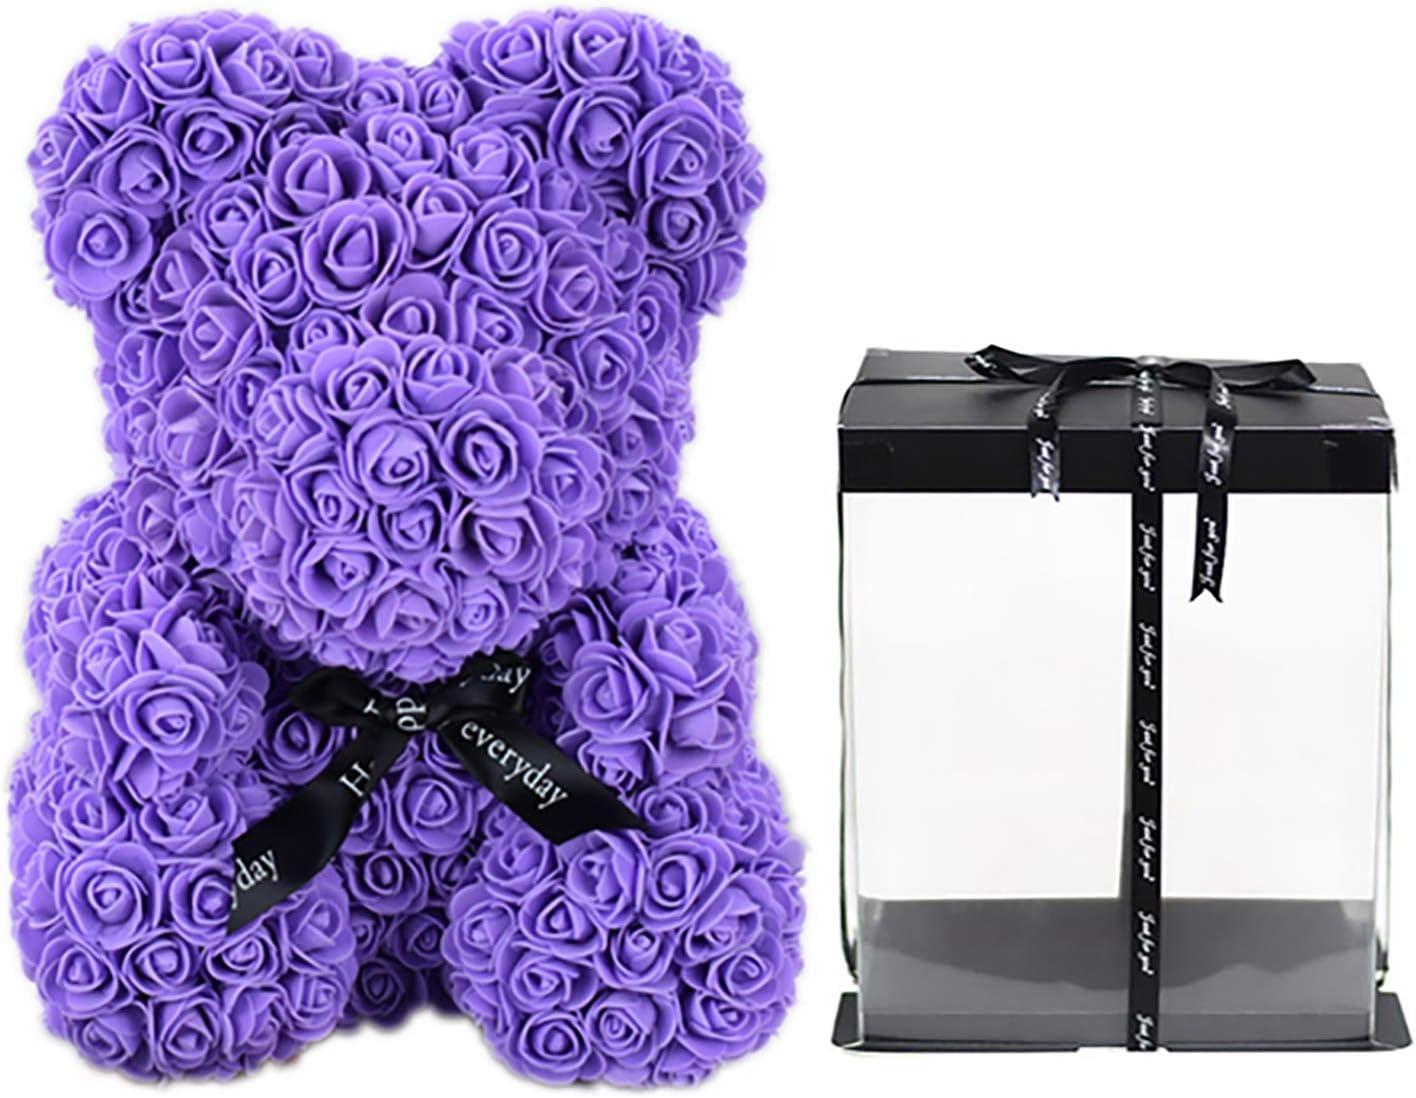 Qivange Rose Bear Teddy Best OFFicial Gift B Flower Omaha Mall Artificial